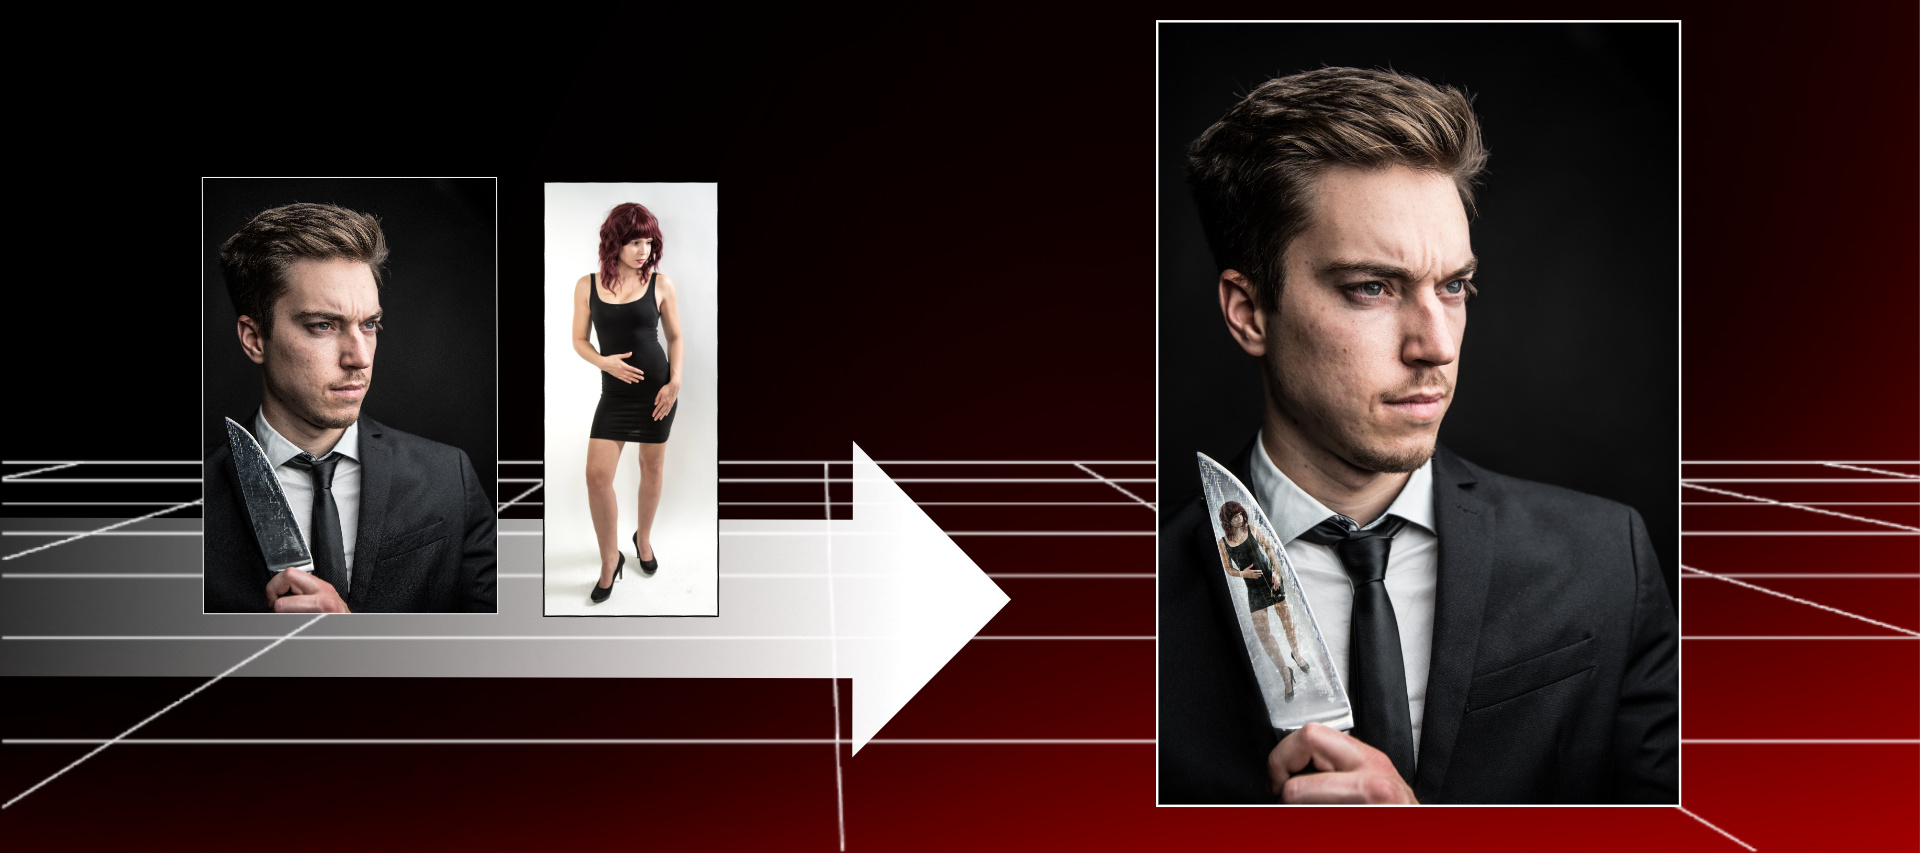 Fotomontage zum Filmthema American Psycho